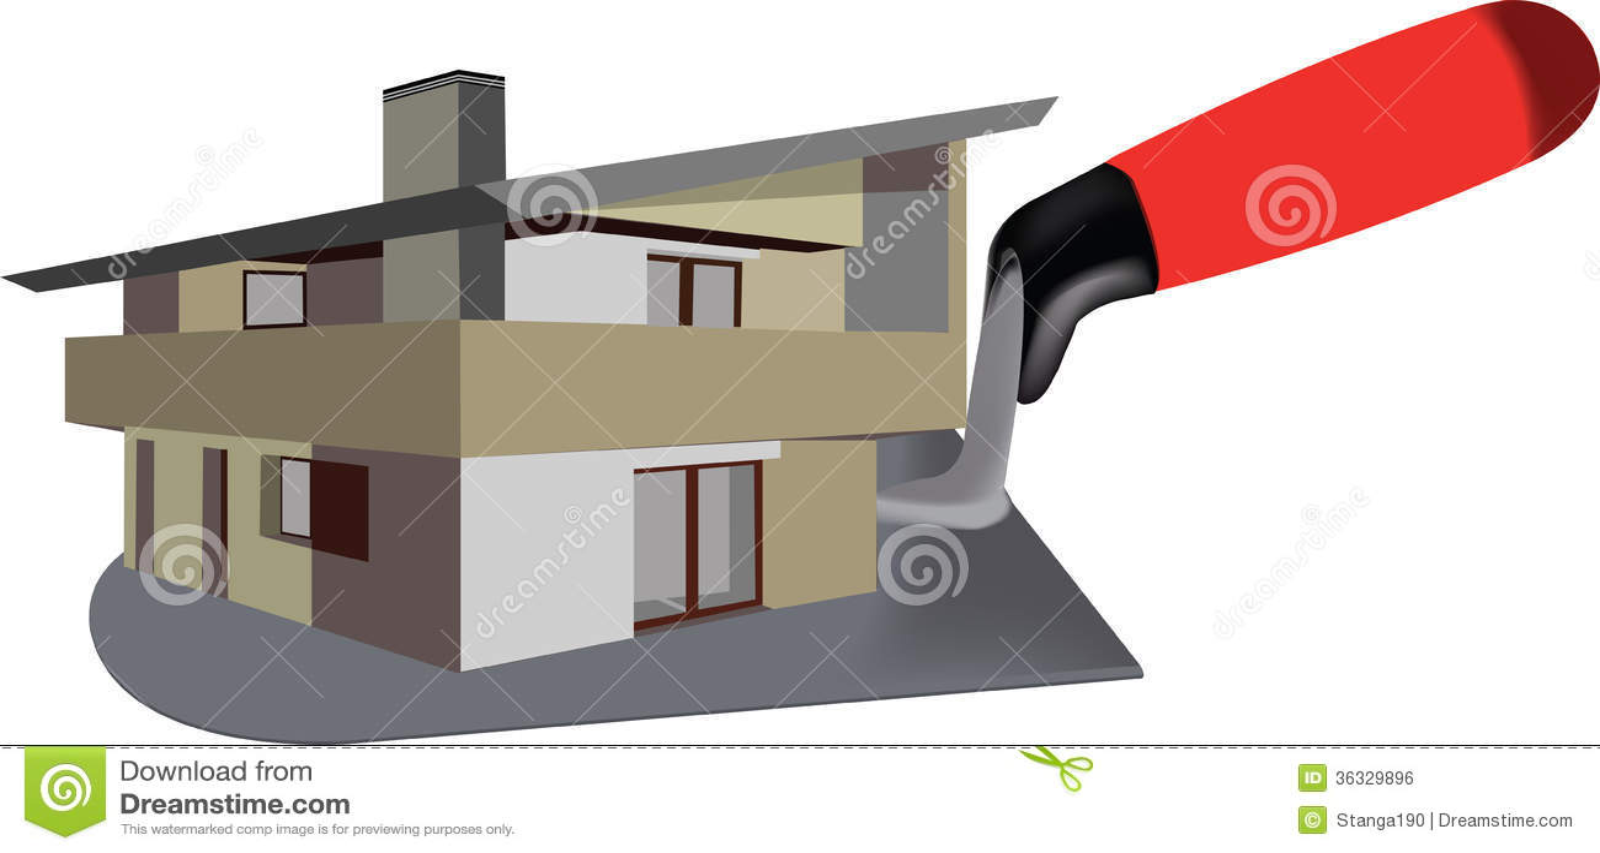 Royalty Free Stock Image Construction Logo Villa Building Trowel Image36329896 on Construction General Contractor Logos